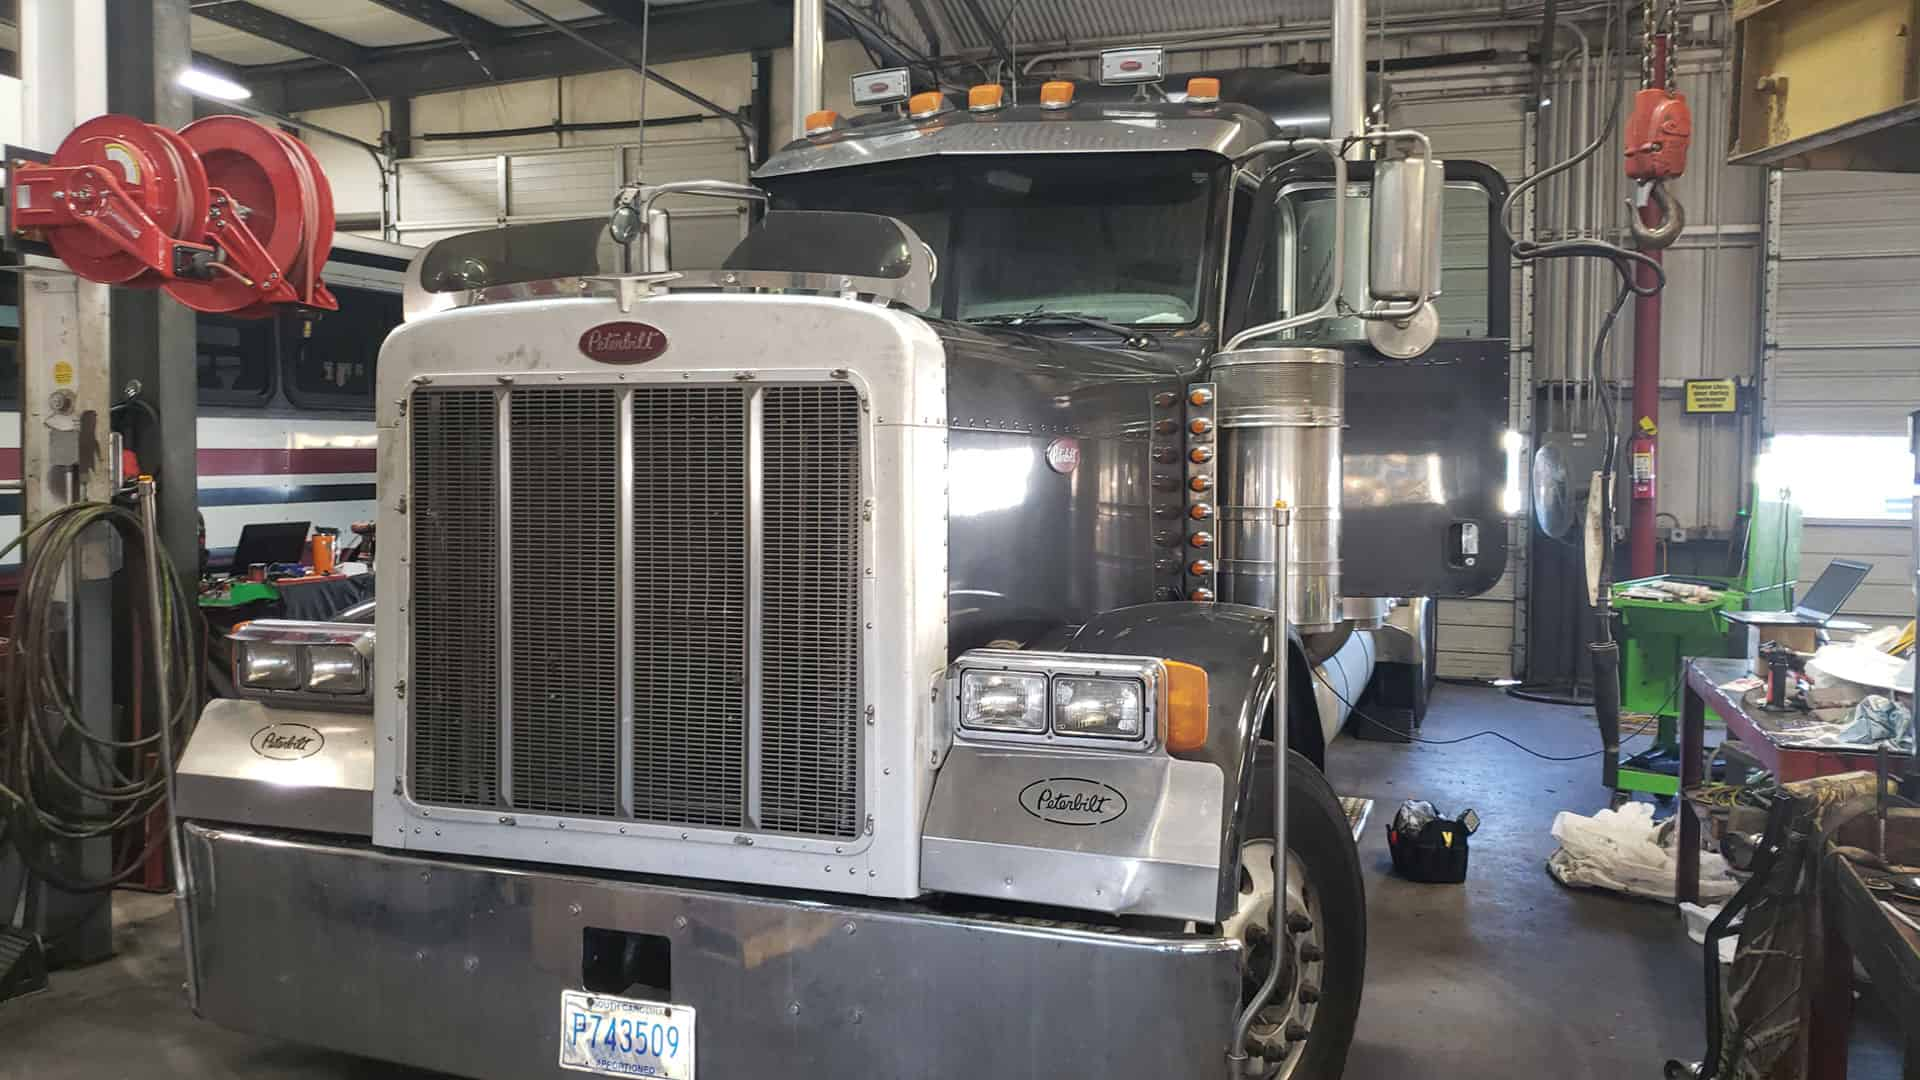 Peterbilt Engine Overhaul Financing Testimonial from Customer 1